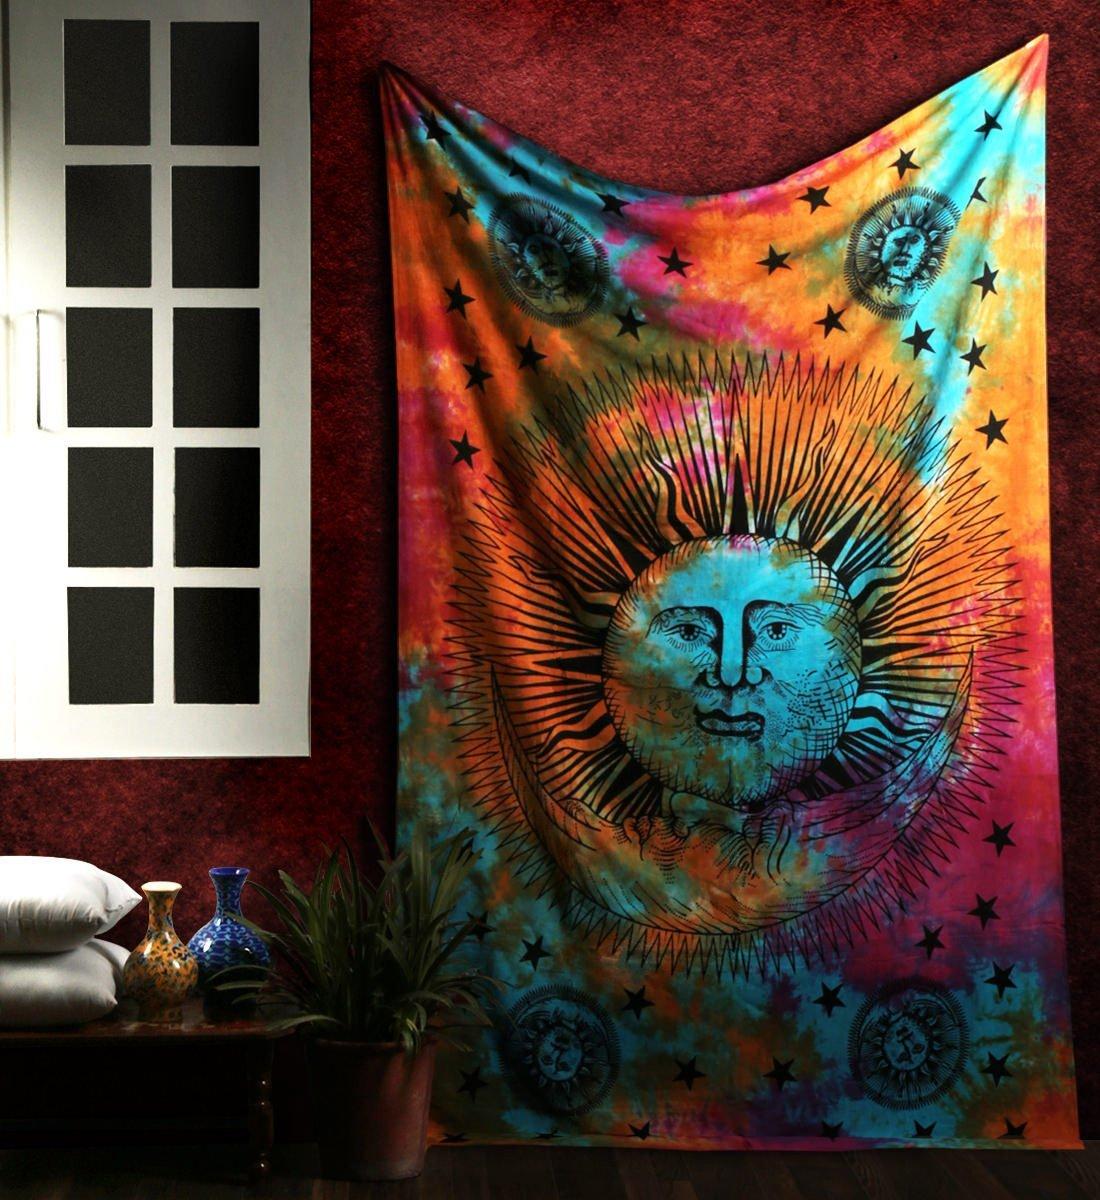 Enipate Psychedelic Celestial Sonne Mond Sterne Tie Dye Strand Handtuch Hippie hippie Sonne-mond Celestial Wandbehang Indian Tapisserie